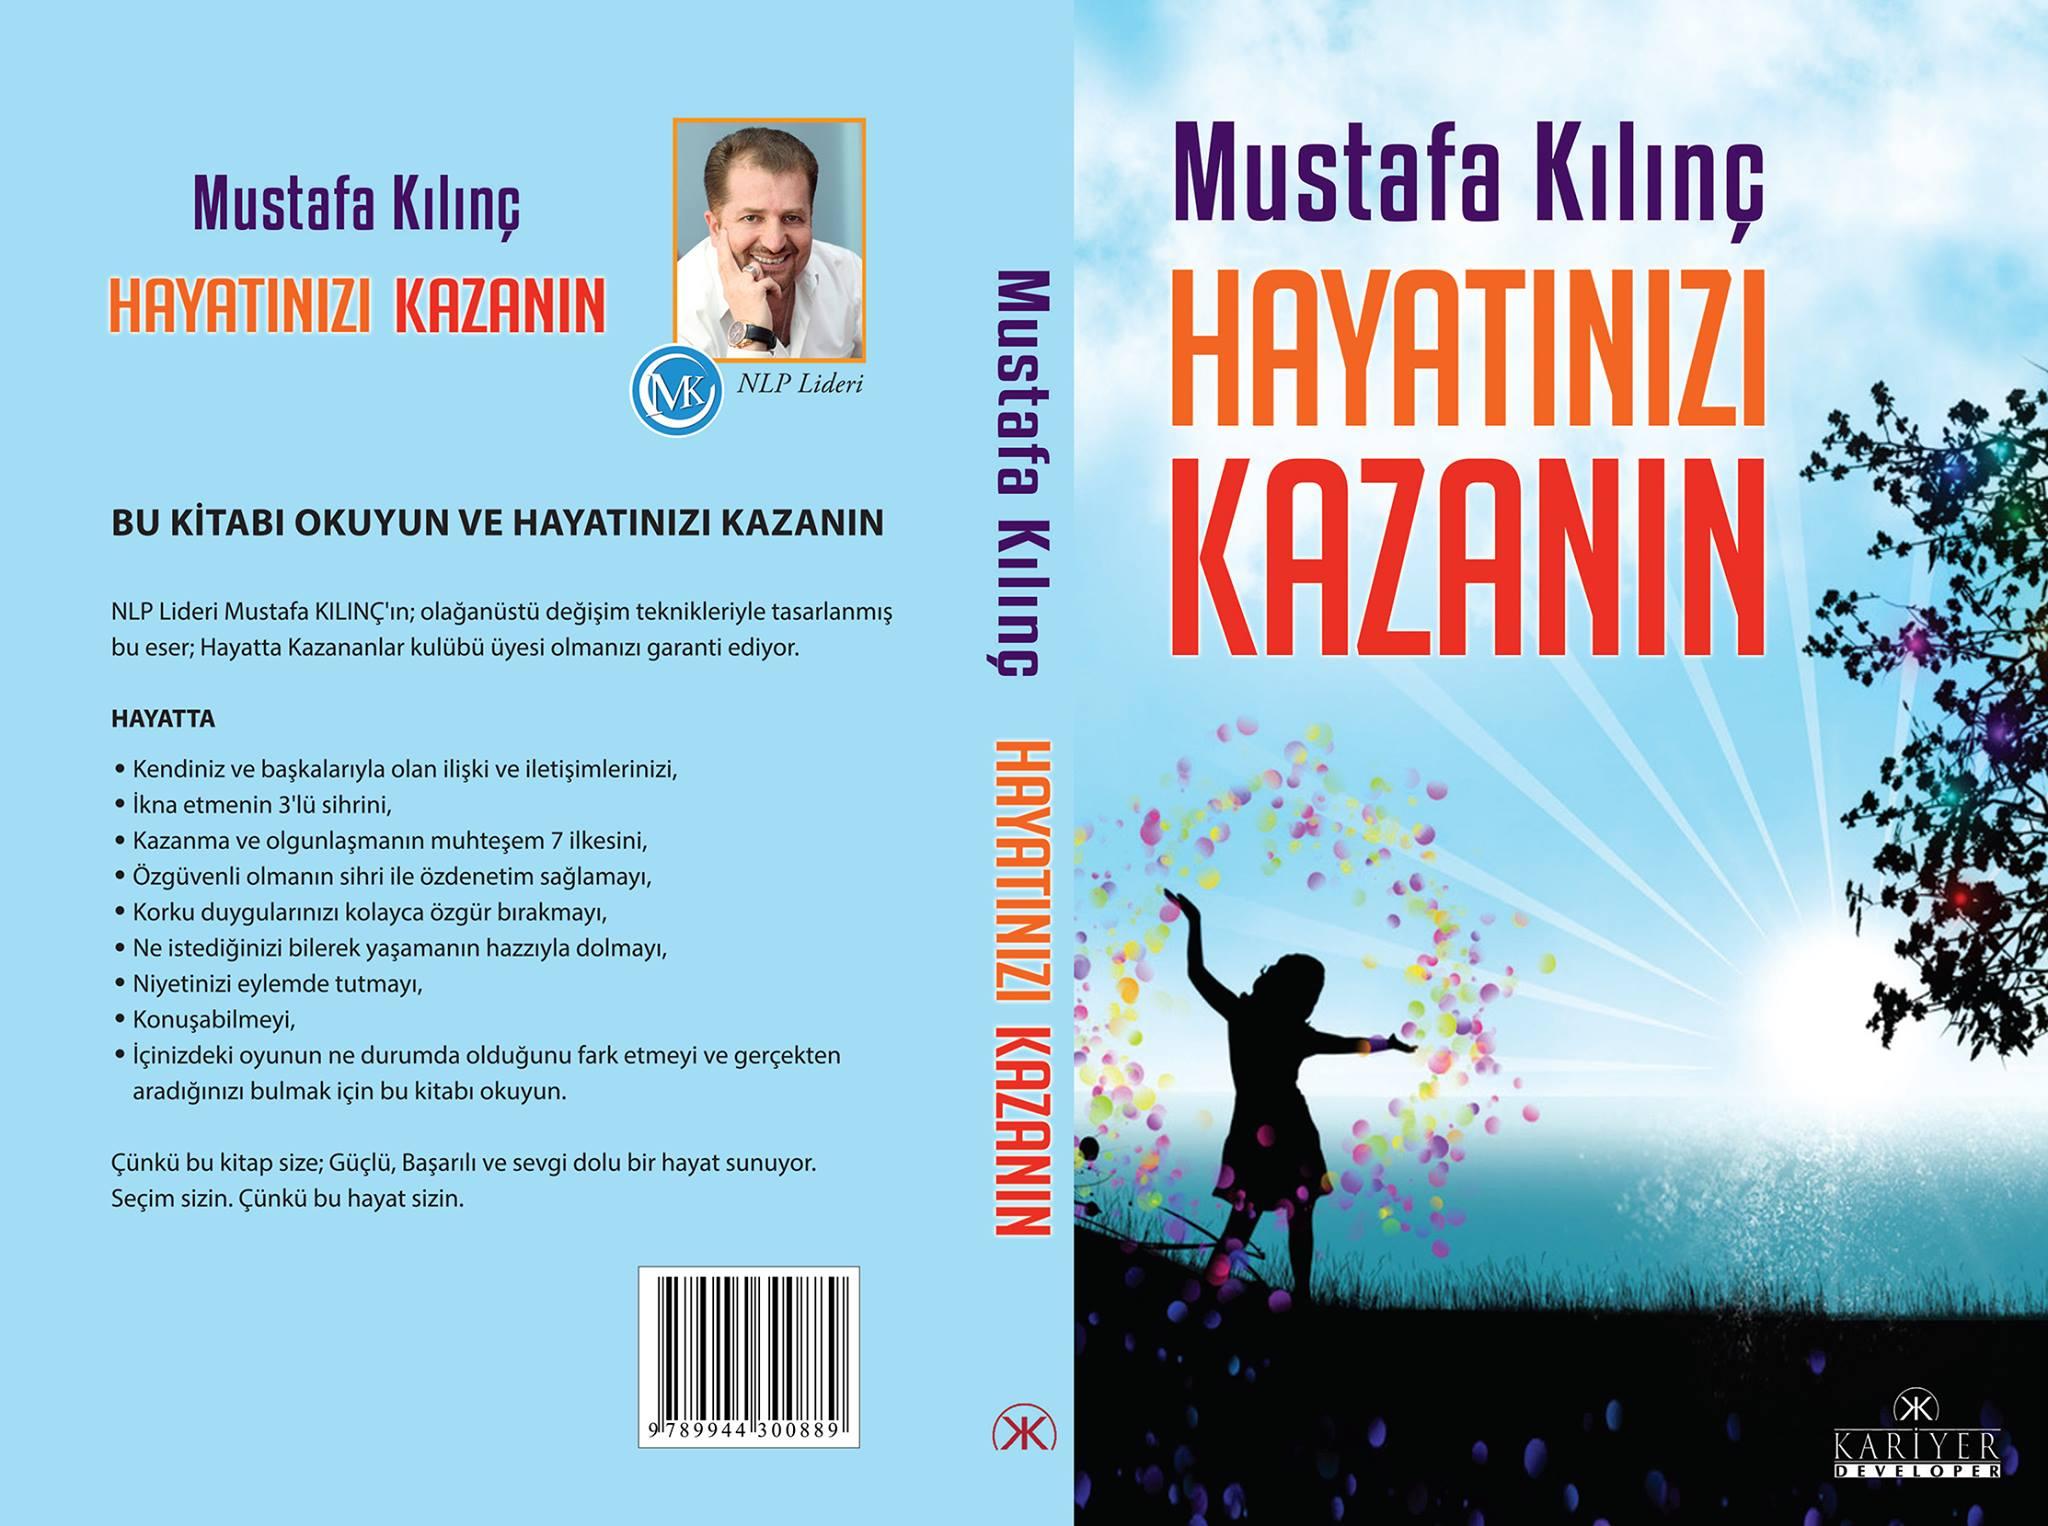 MUSTAFA KILINÇ - HAYATINIZI KAZANIN